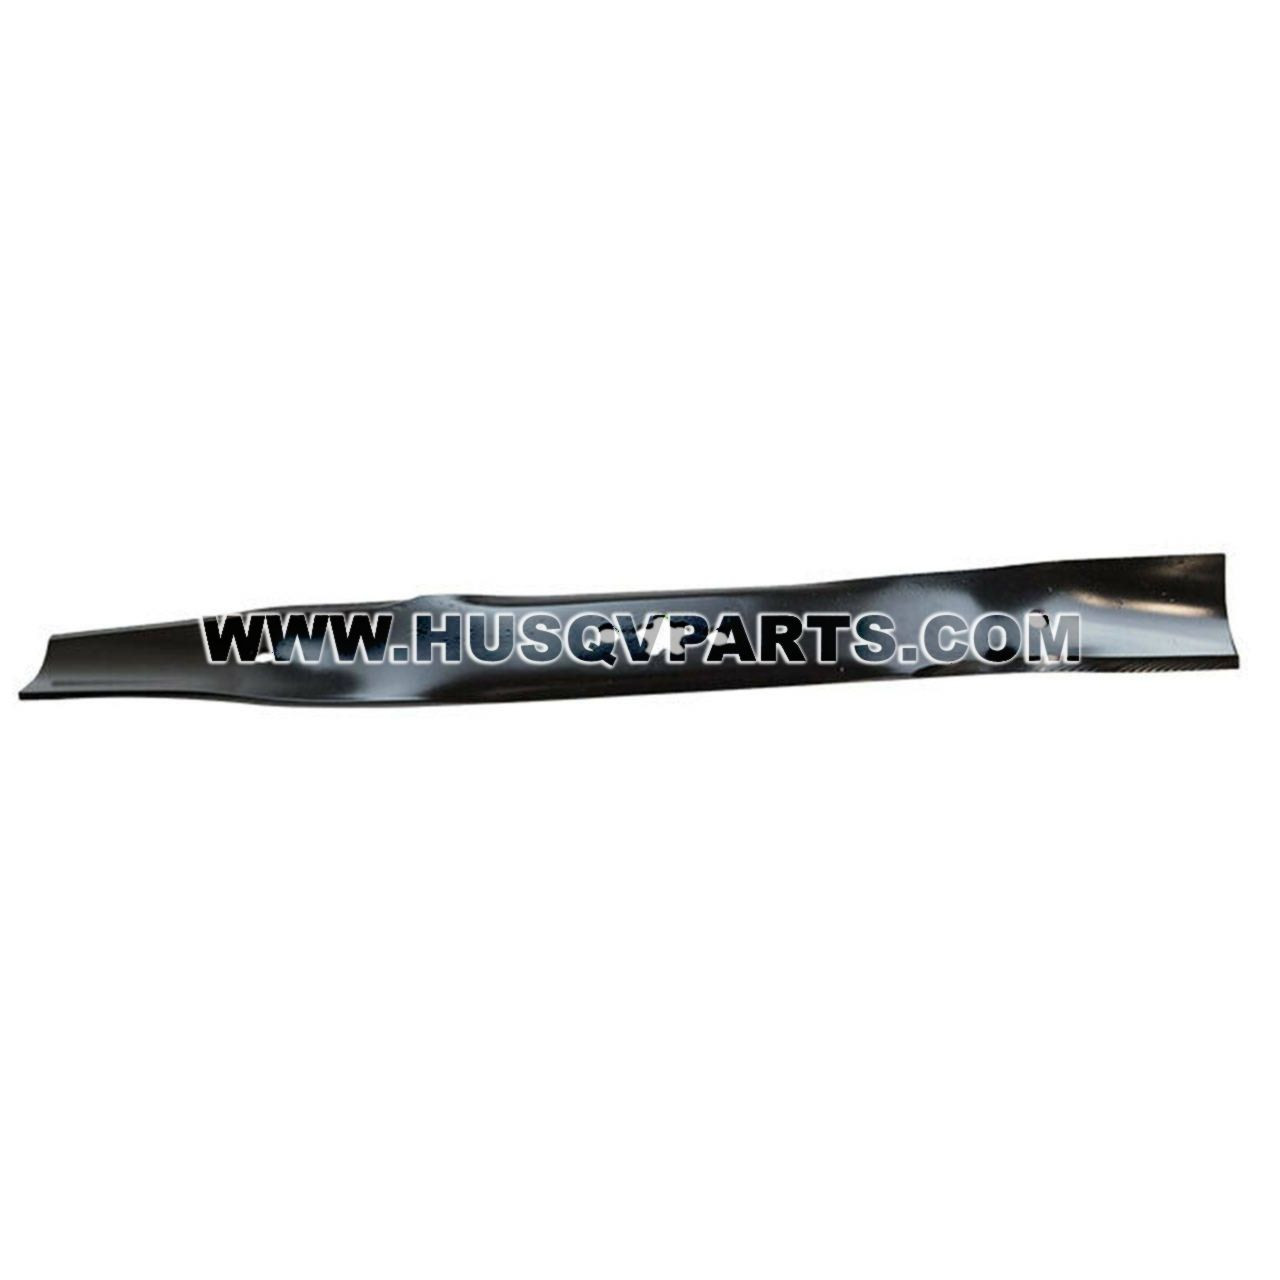 HUSQVARNA Blade Reaper 21 W/O Notch 428 586859604 Image 1